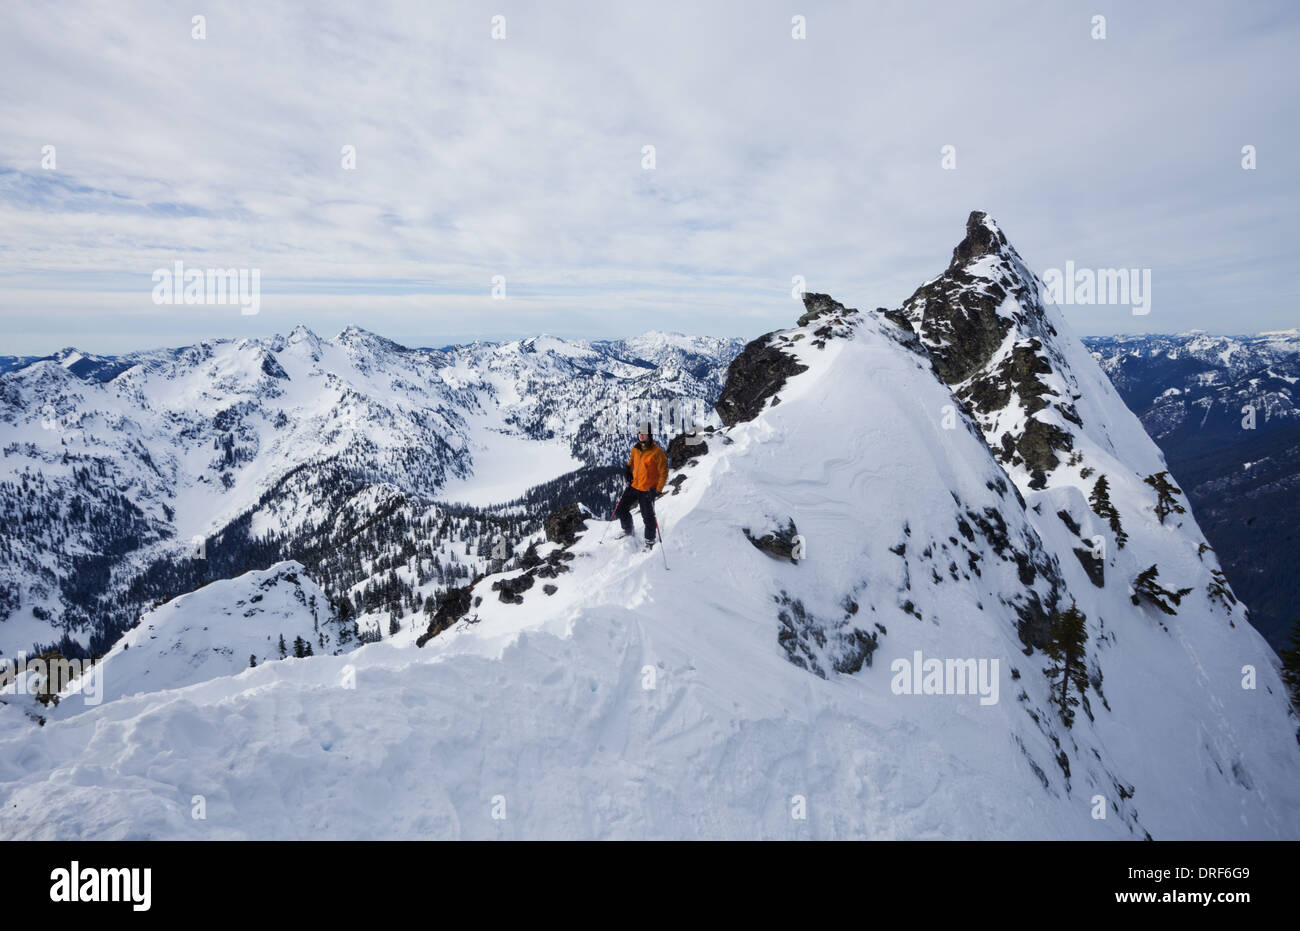 Snoqualmie Peak Washington state USA. The Slot Snoqualmie Peak Cascades Ranges USA skier - Stock Image